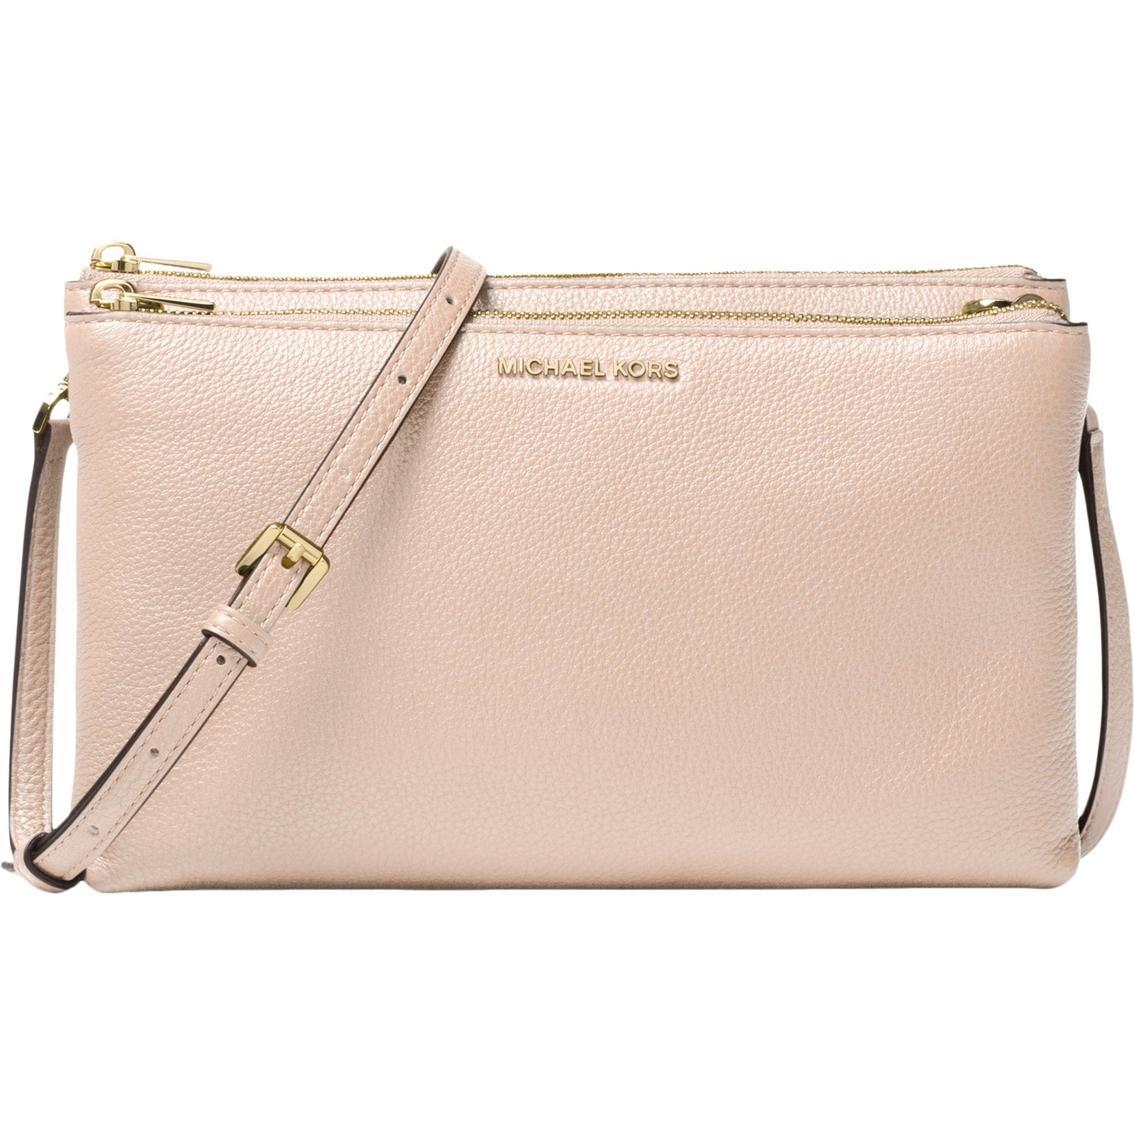 0d0b959cb Michael Kors Adele Double Zip Crossbody Handbag | Handbags | Shop ...